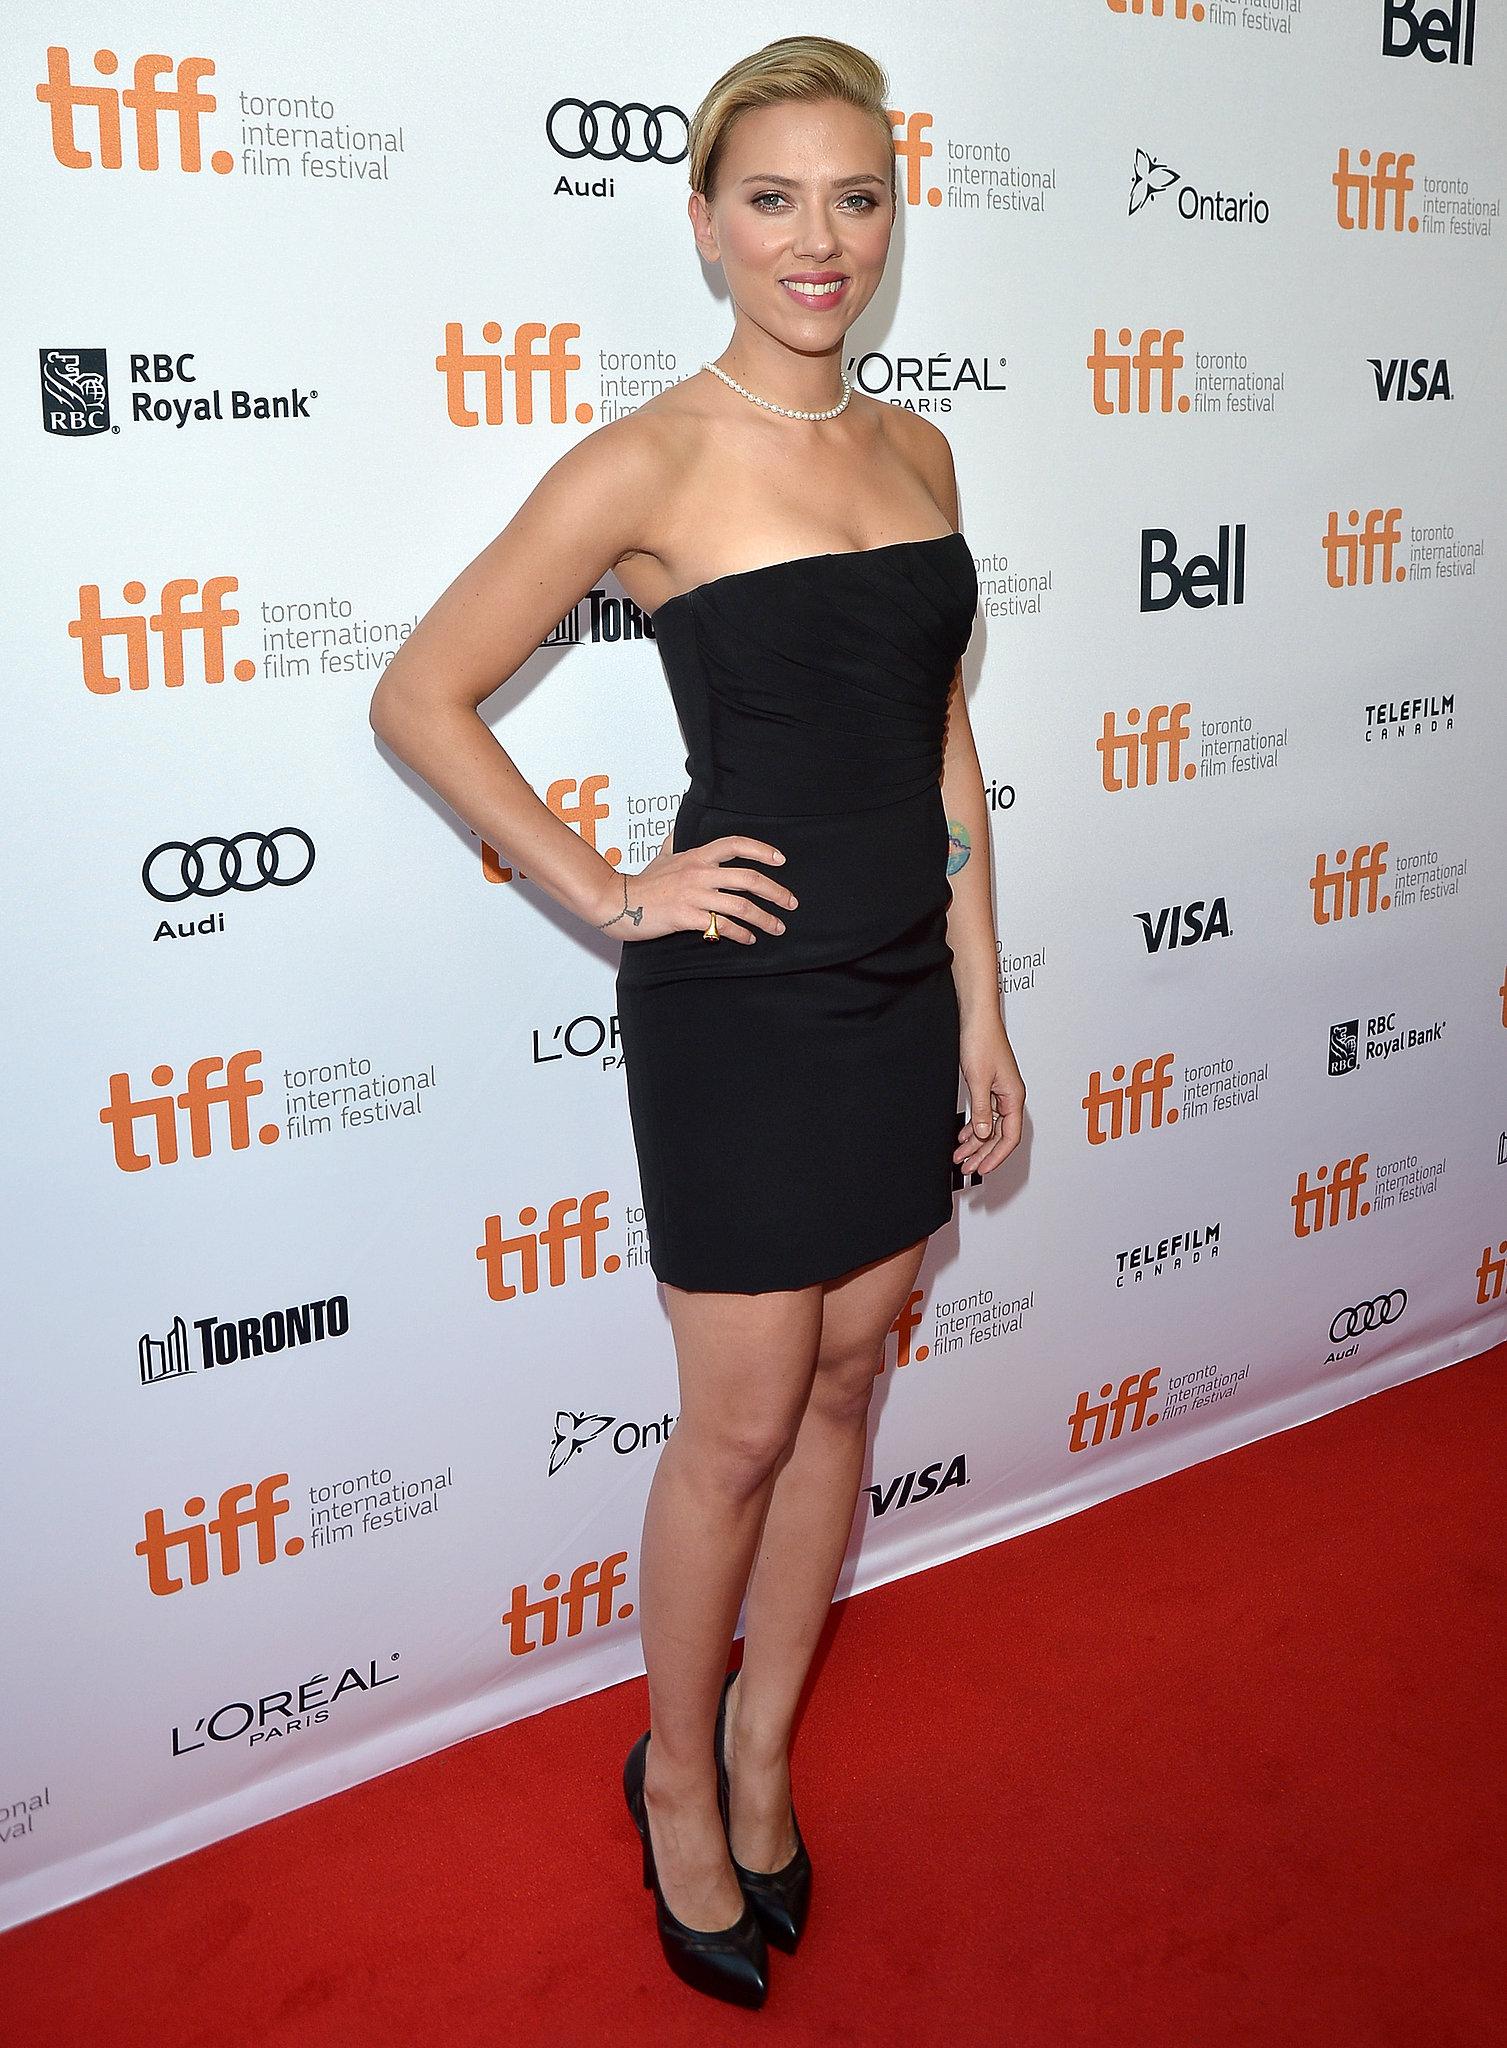 Scarlett Johansson at the Toronto Film Festival, 2013